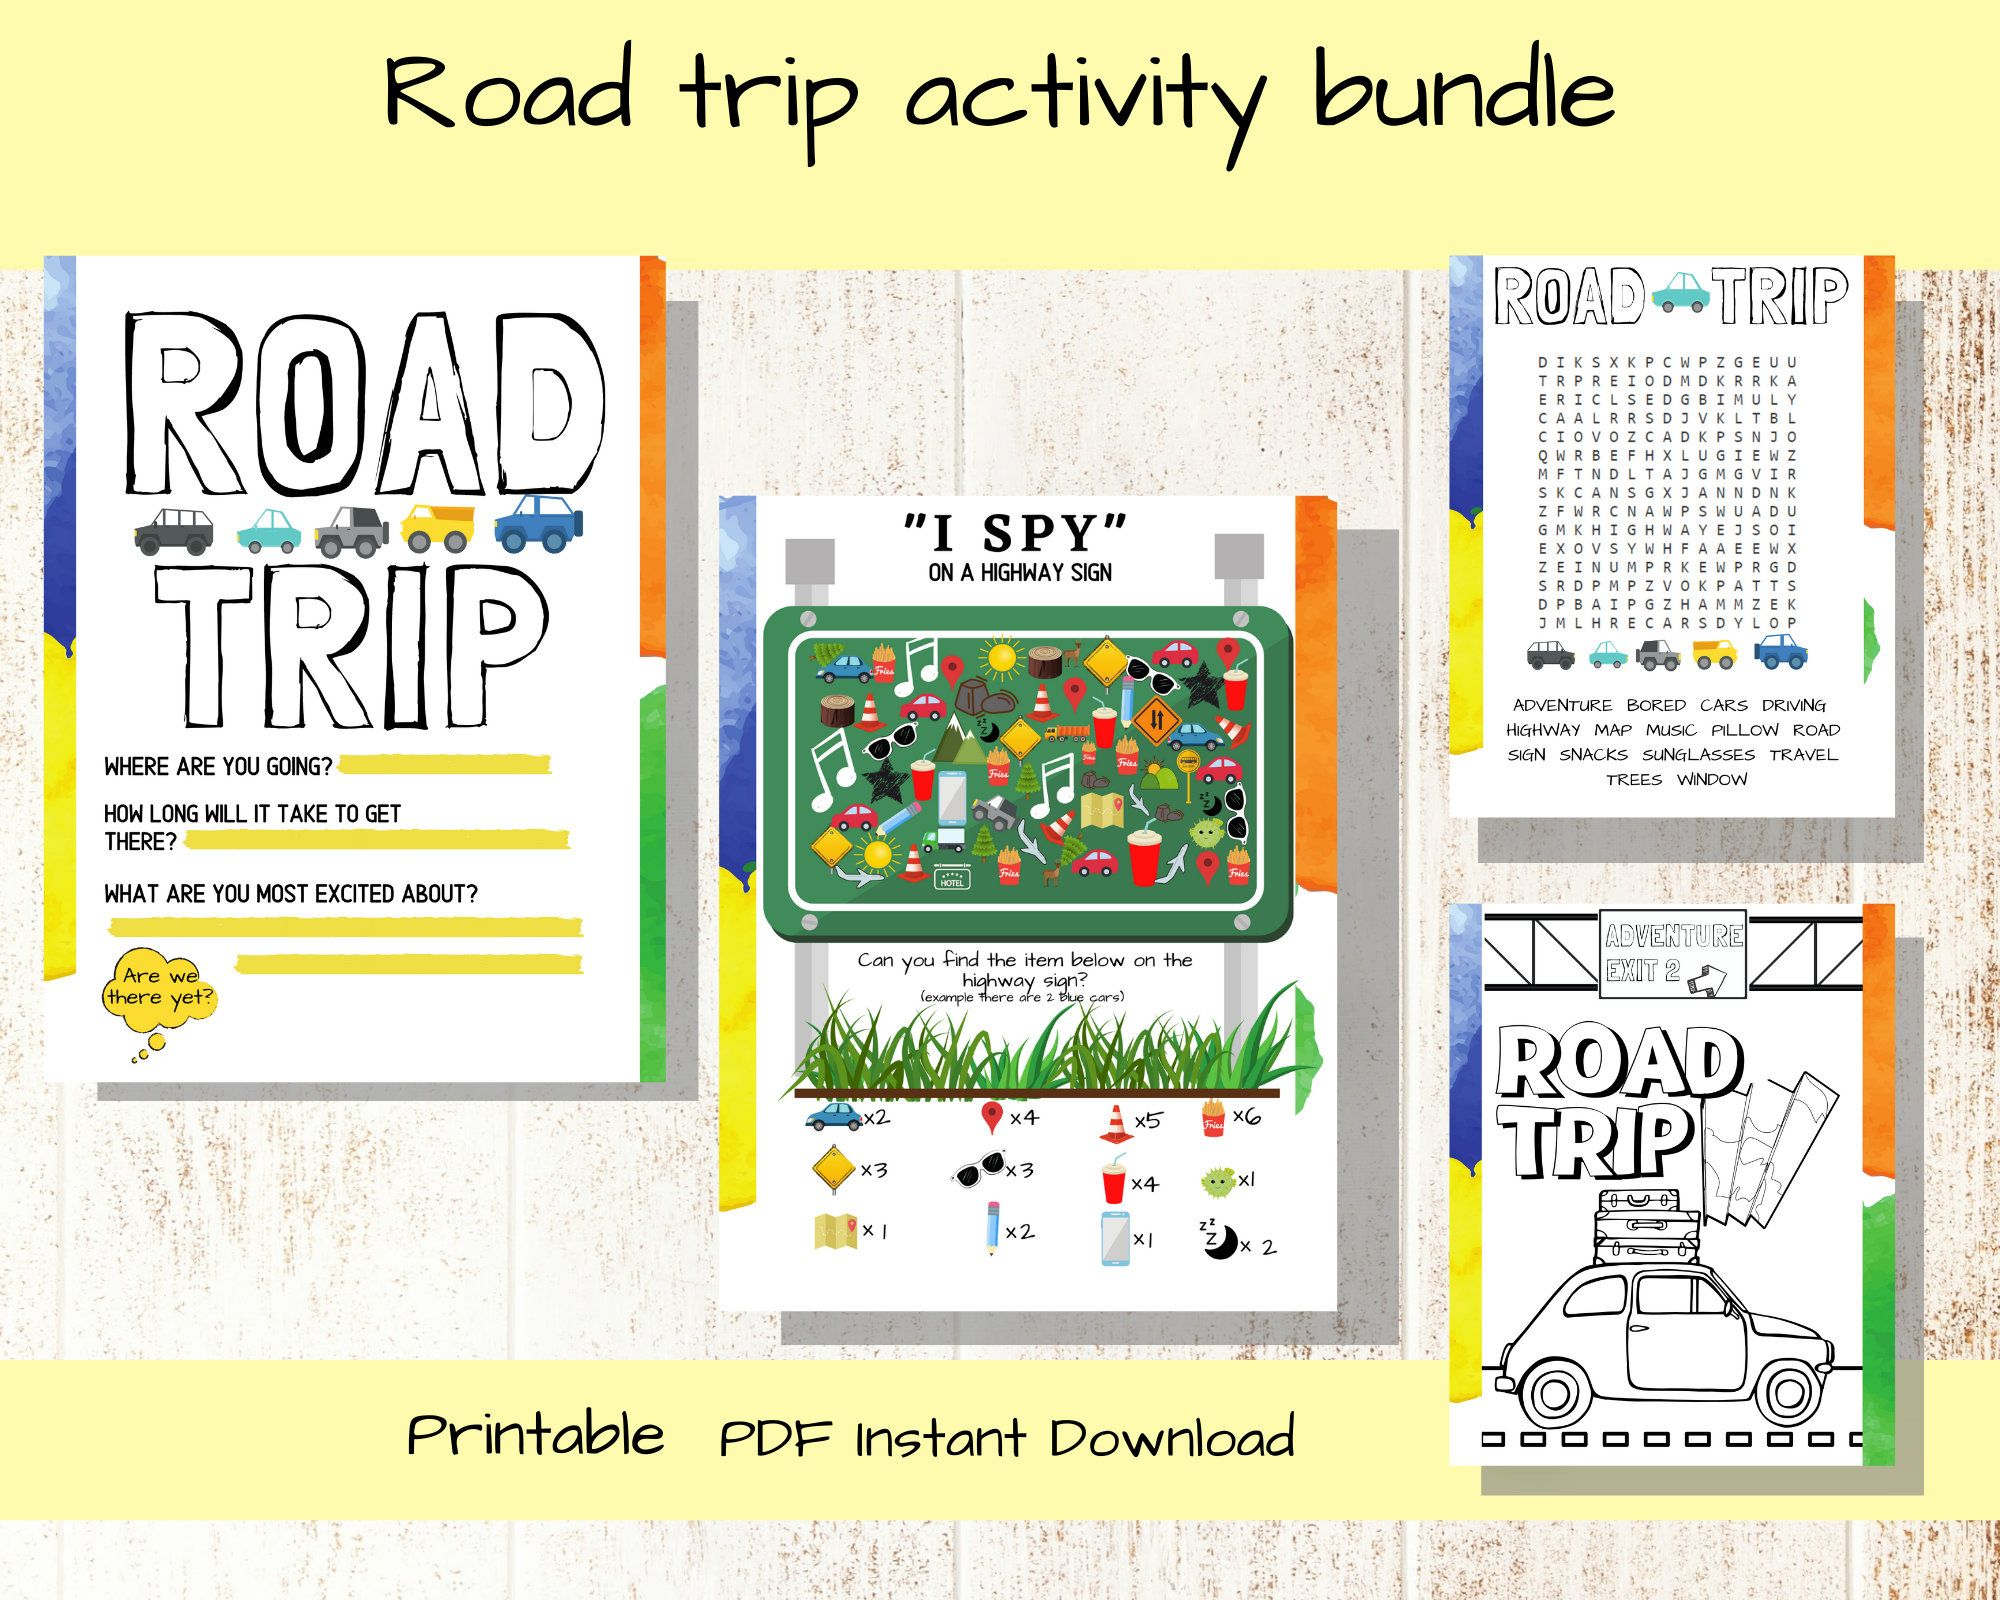 Road Trip Printable Activity Pack For Kids Scavenger